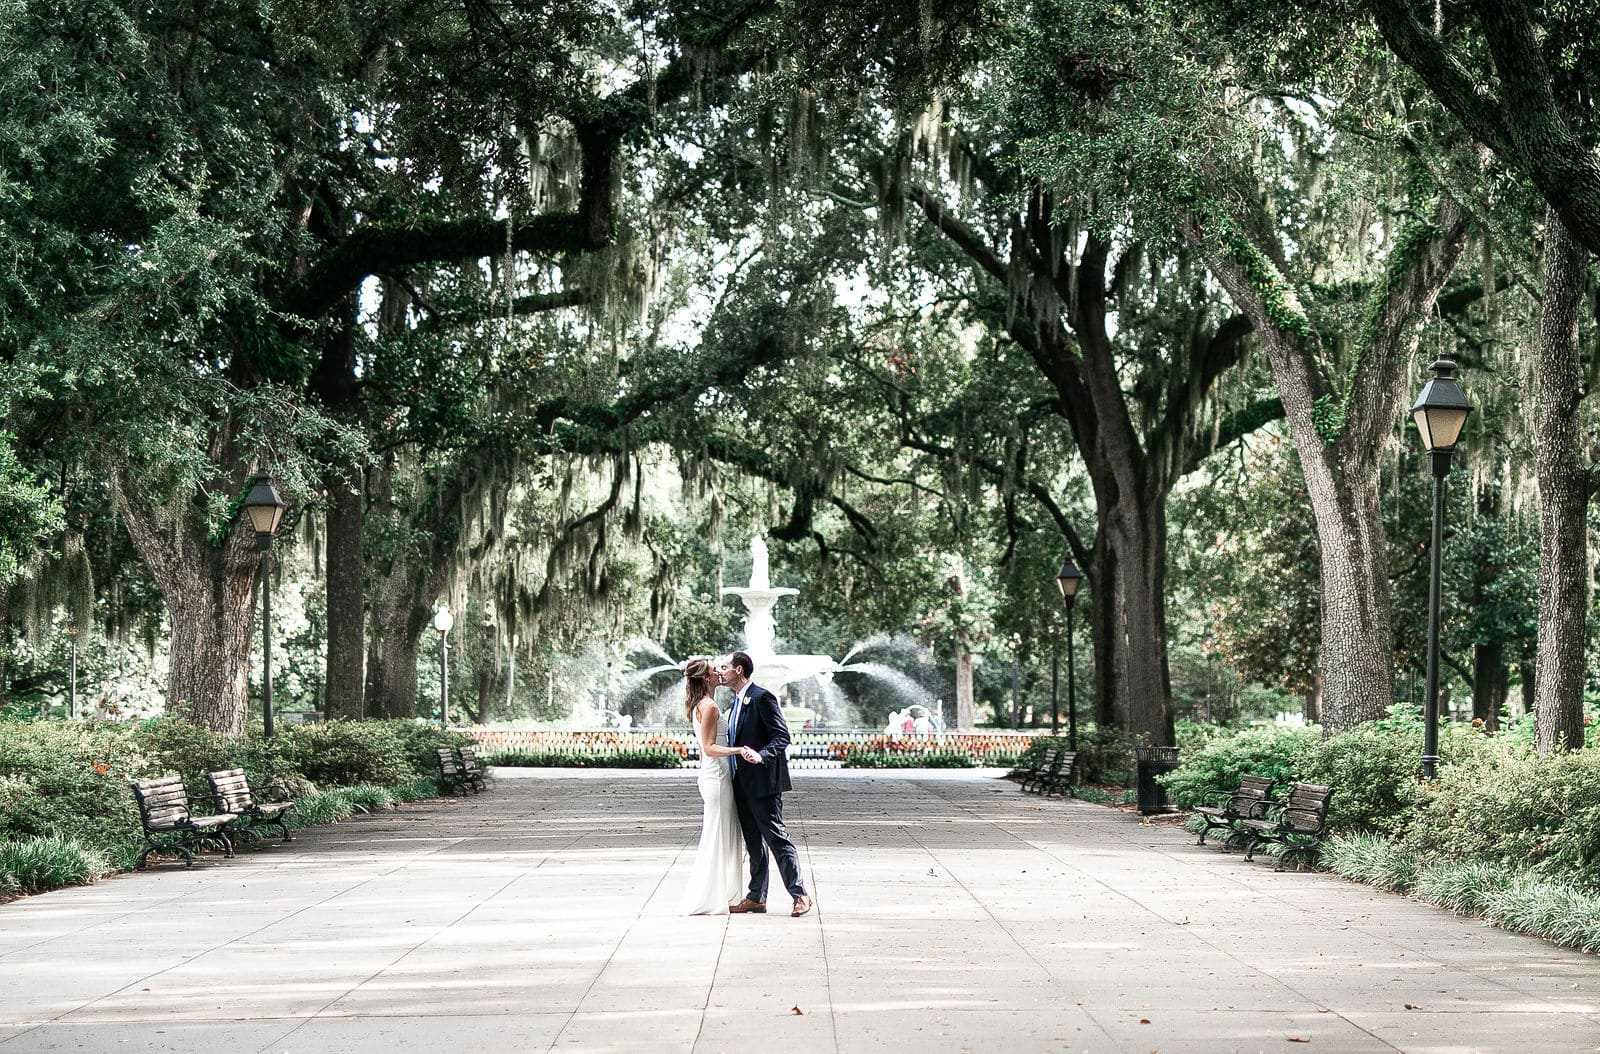 savannah elopement experience